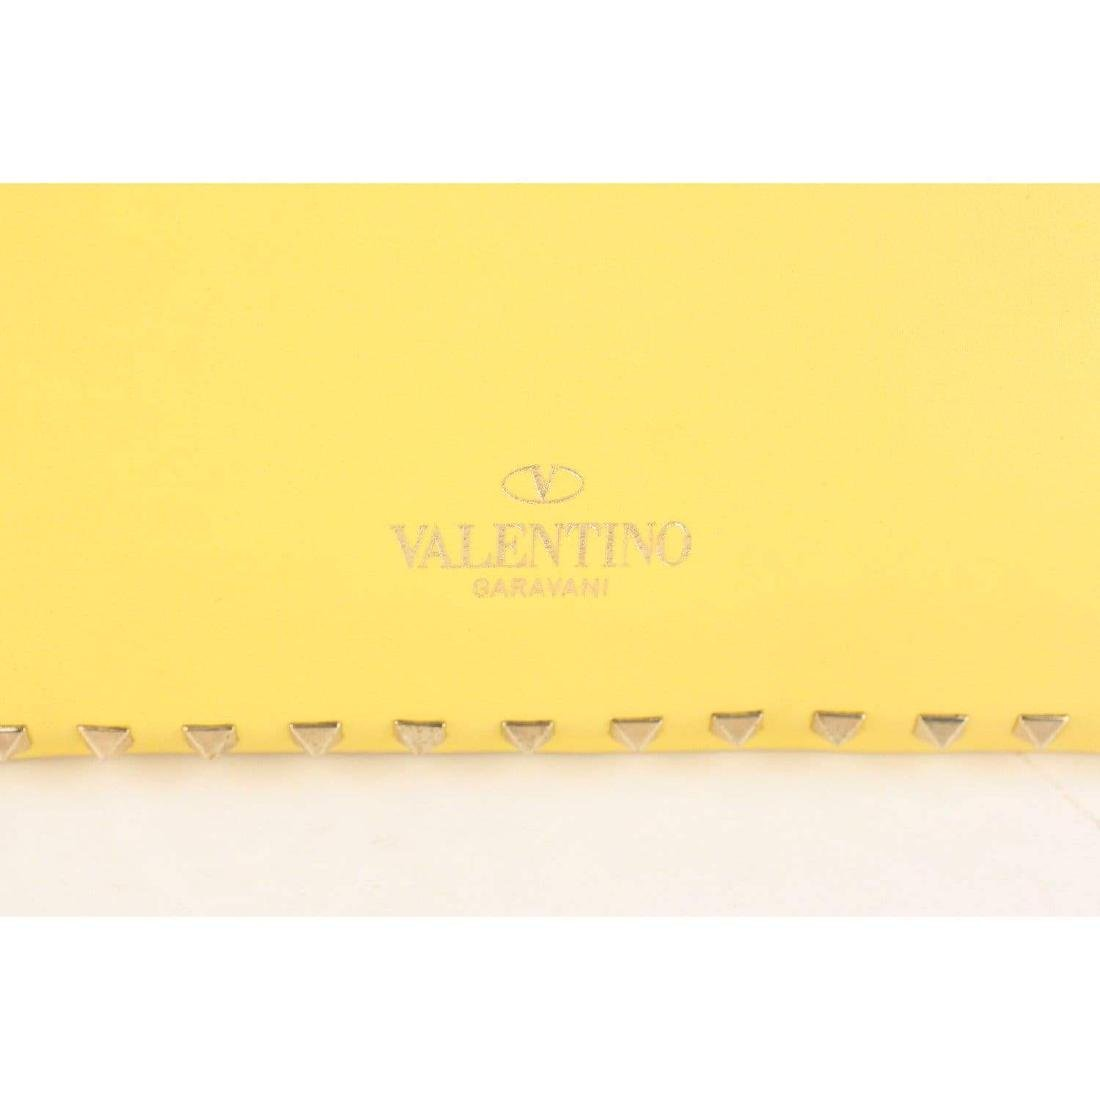 Valentino Rockstud Large Clutch Wrist Bag - 8